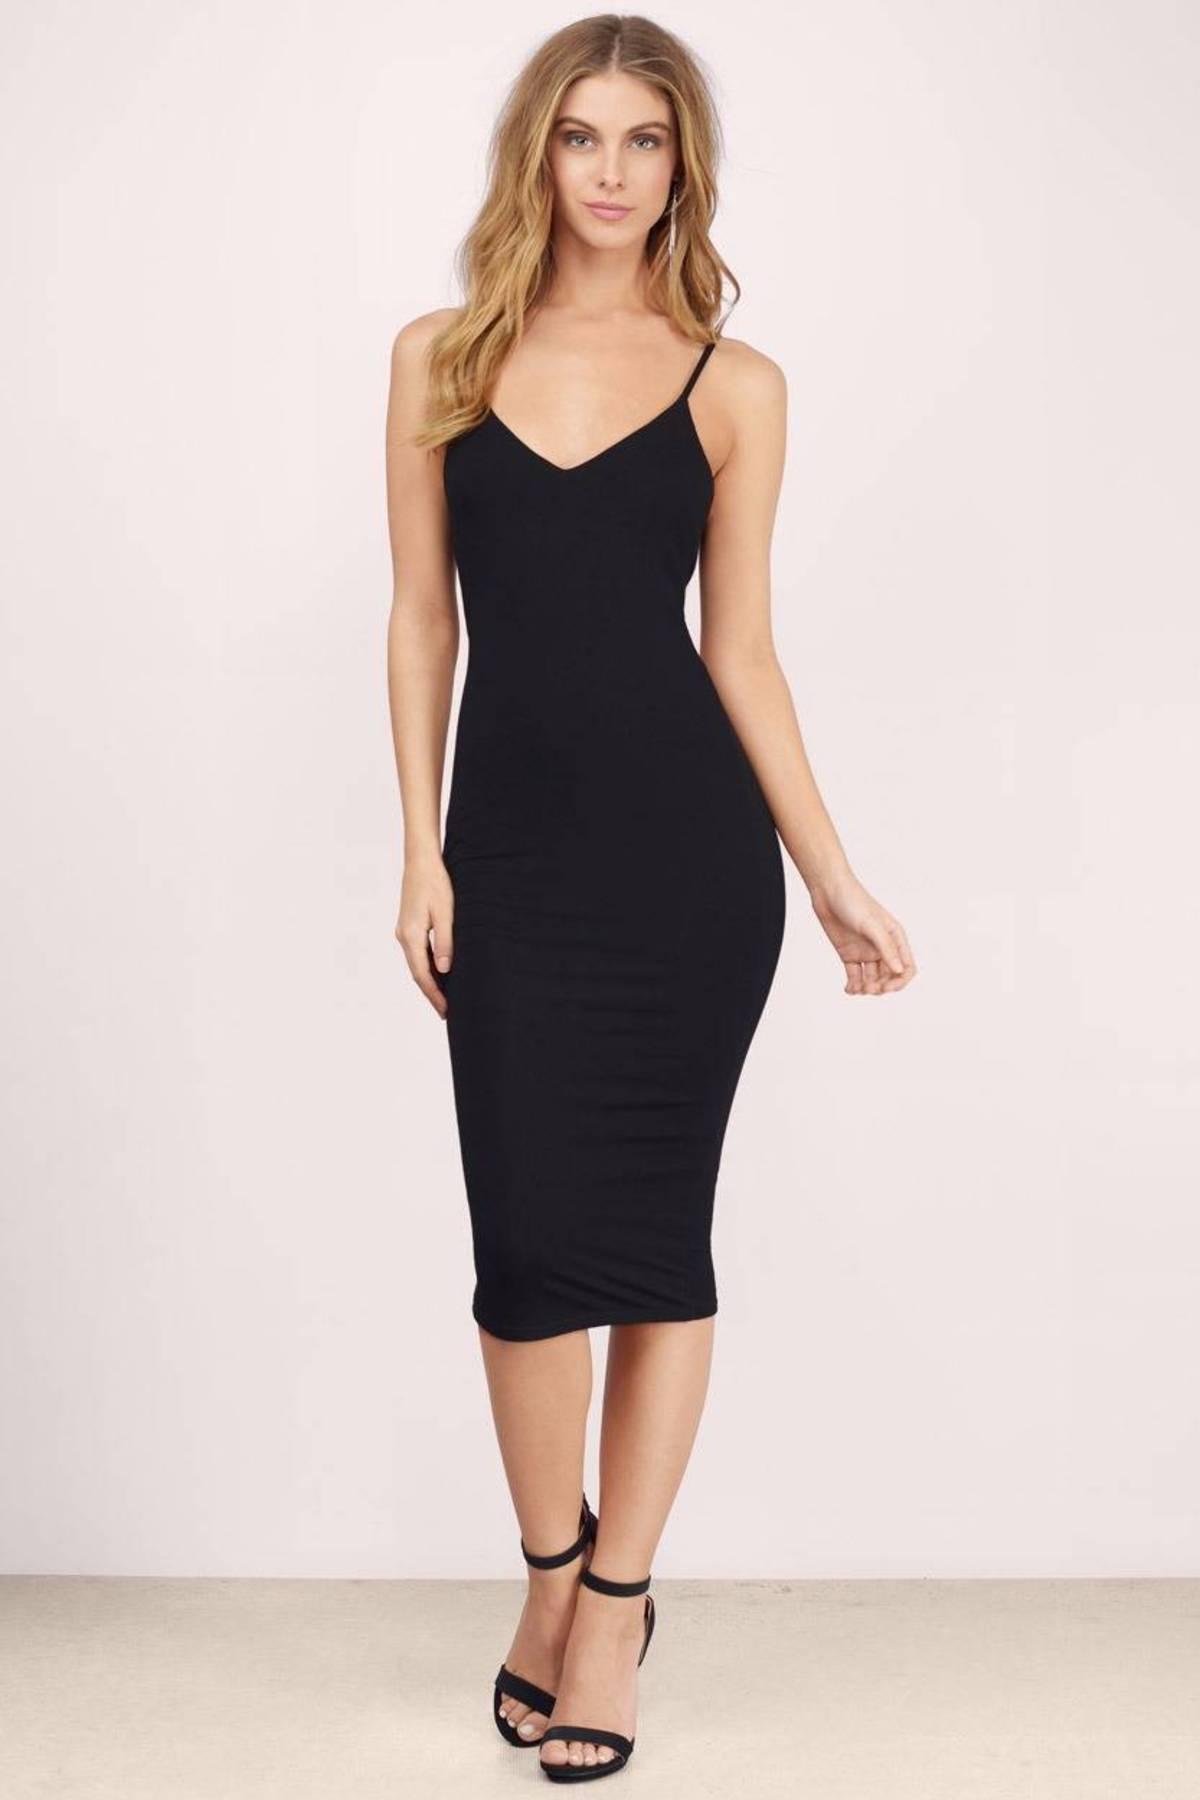 Sexy Taupe Bodycon Dress - Brown Dress - V Neck Dress - $66.00